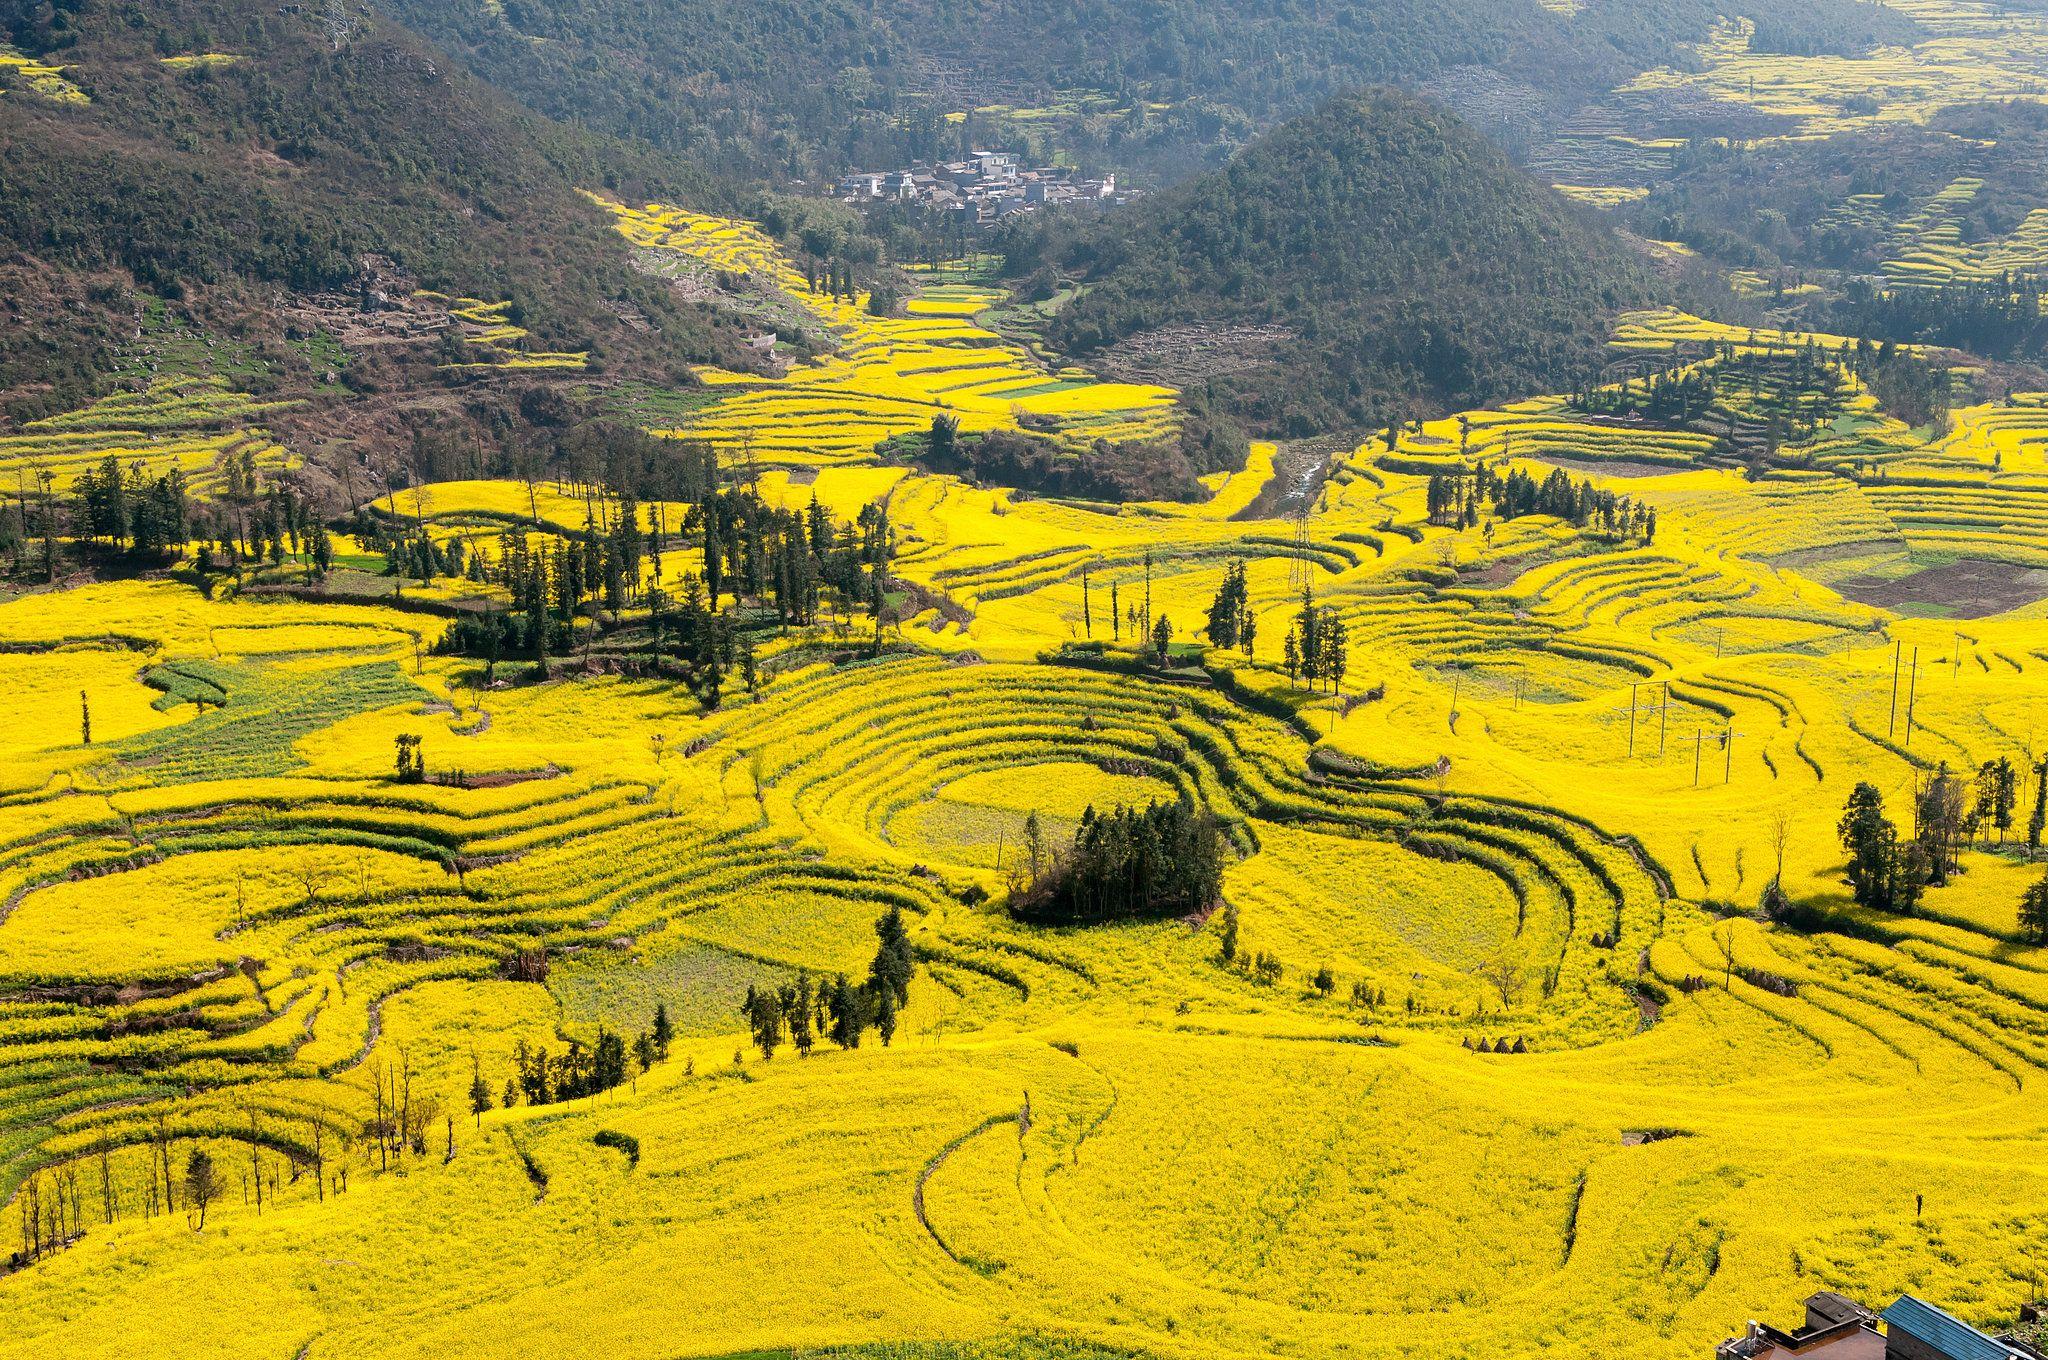 Canola Flower Field In China 1920x1200 Beautiful Wallpaper